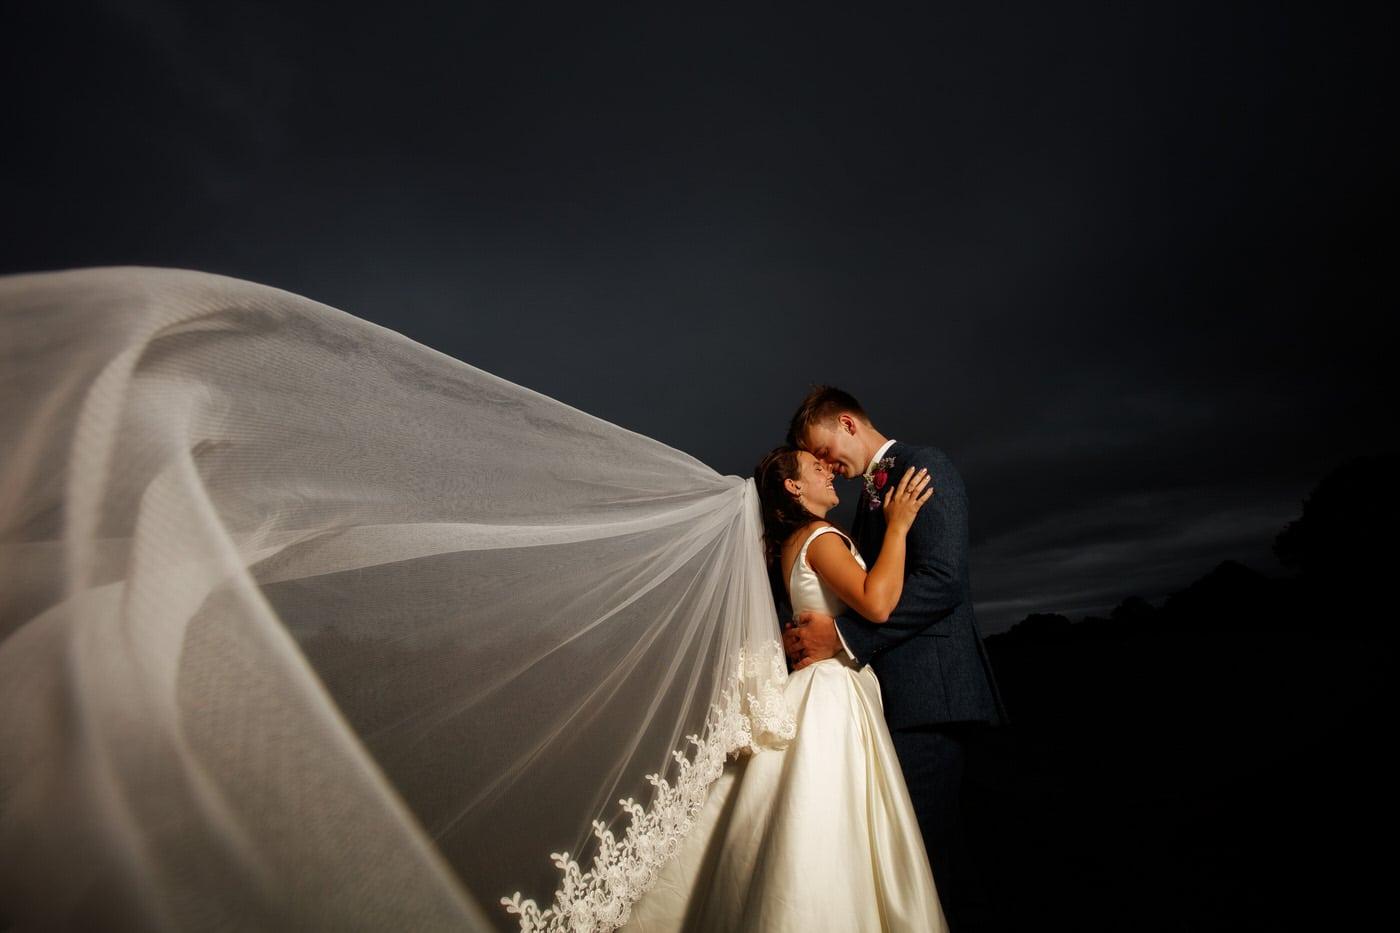 wedding photographer shropshire captures creative portrait of bride and groom